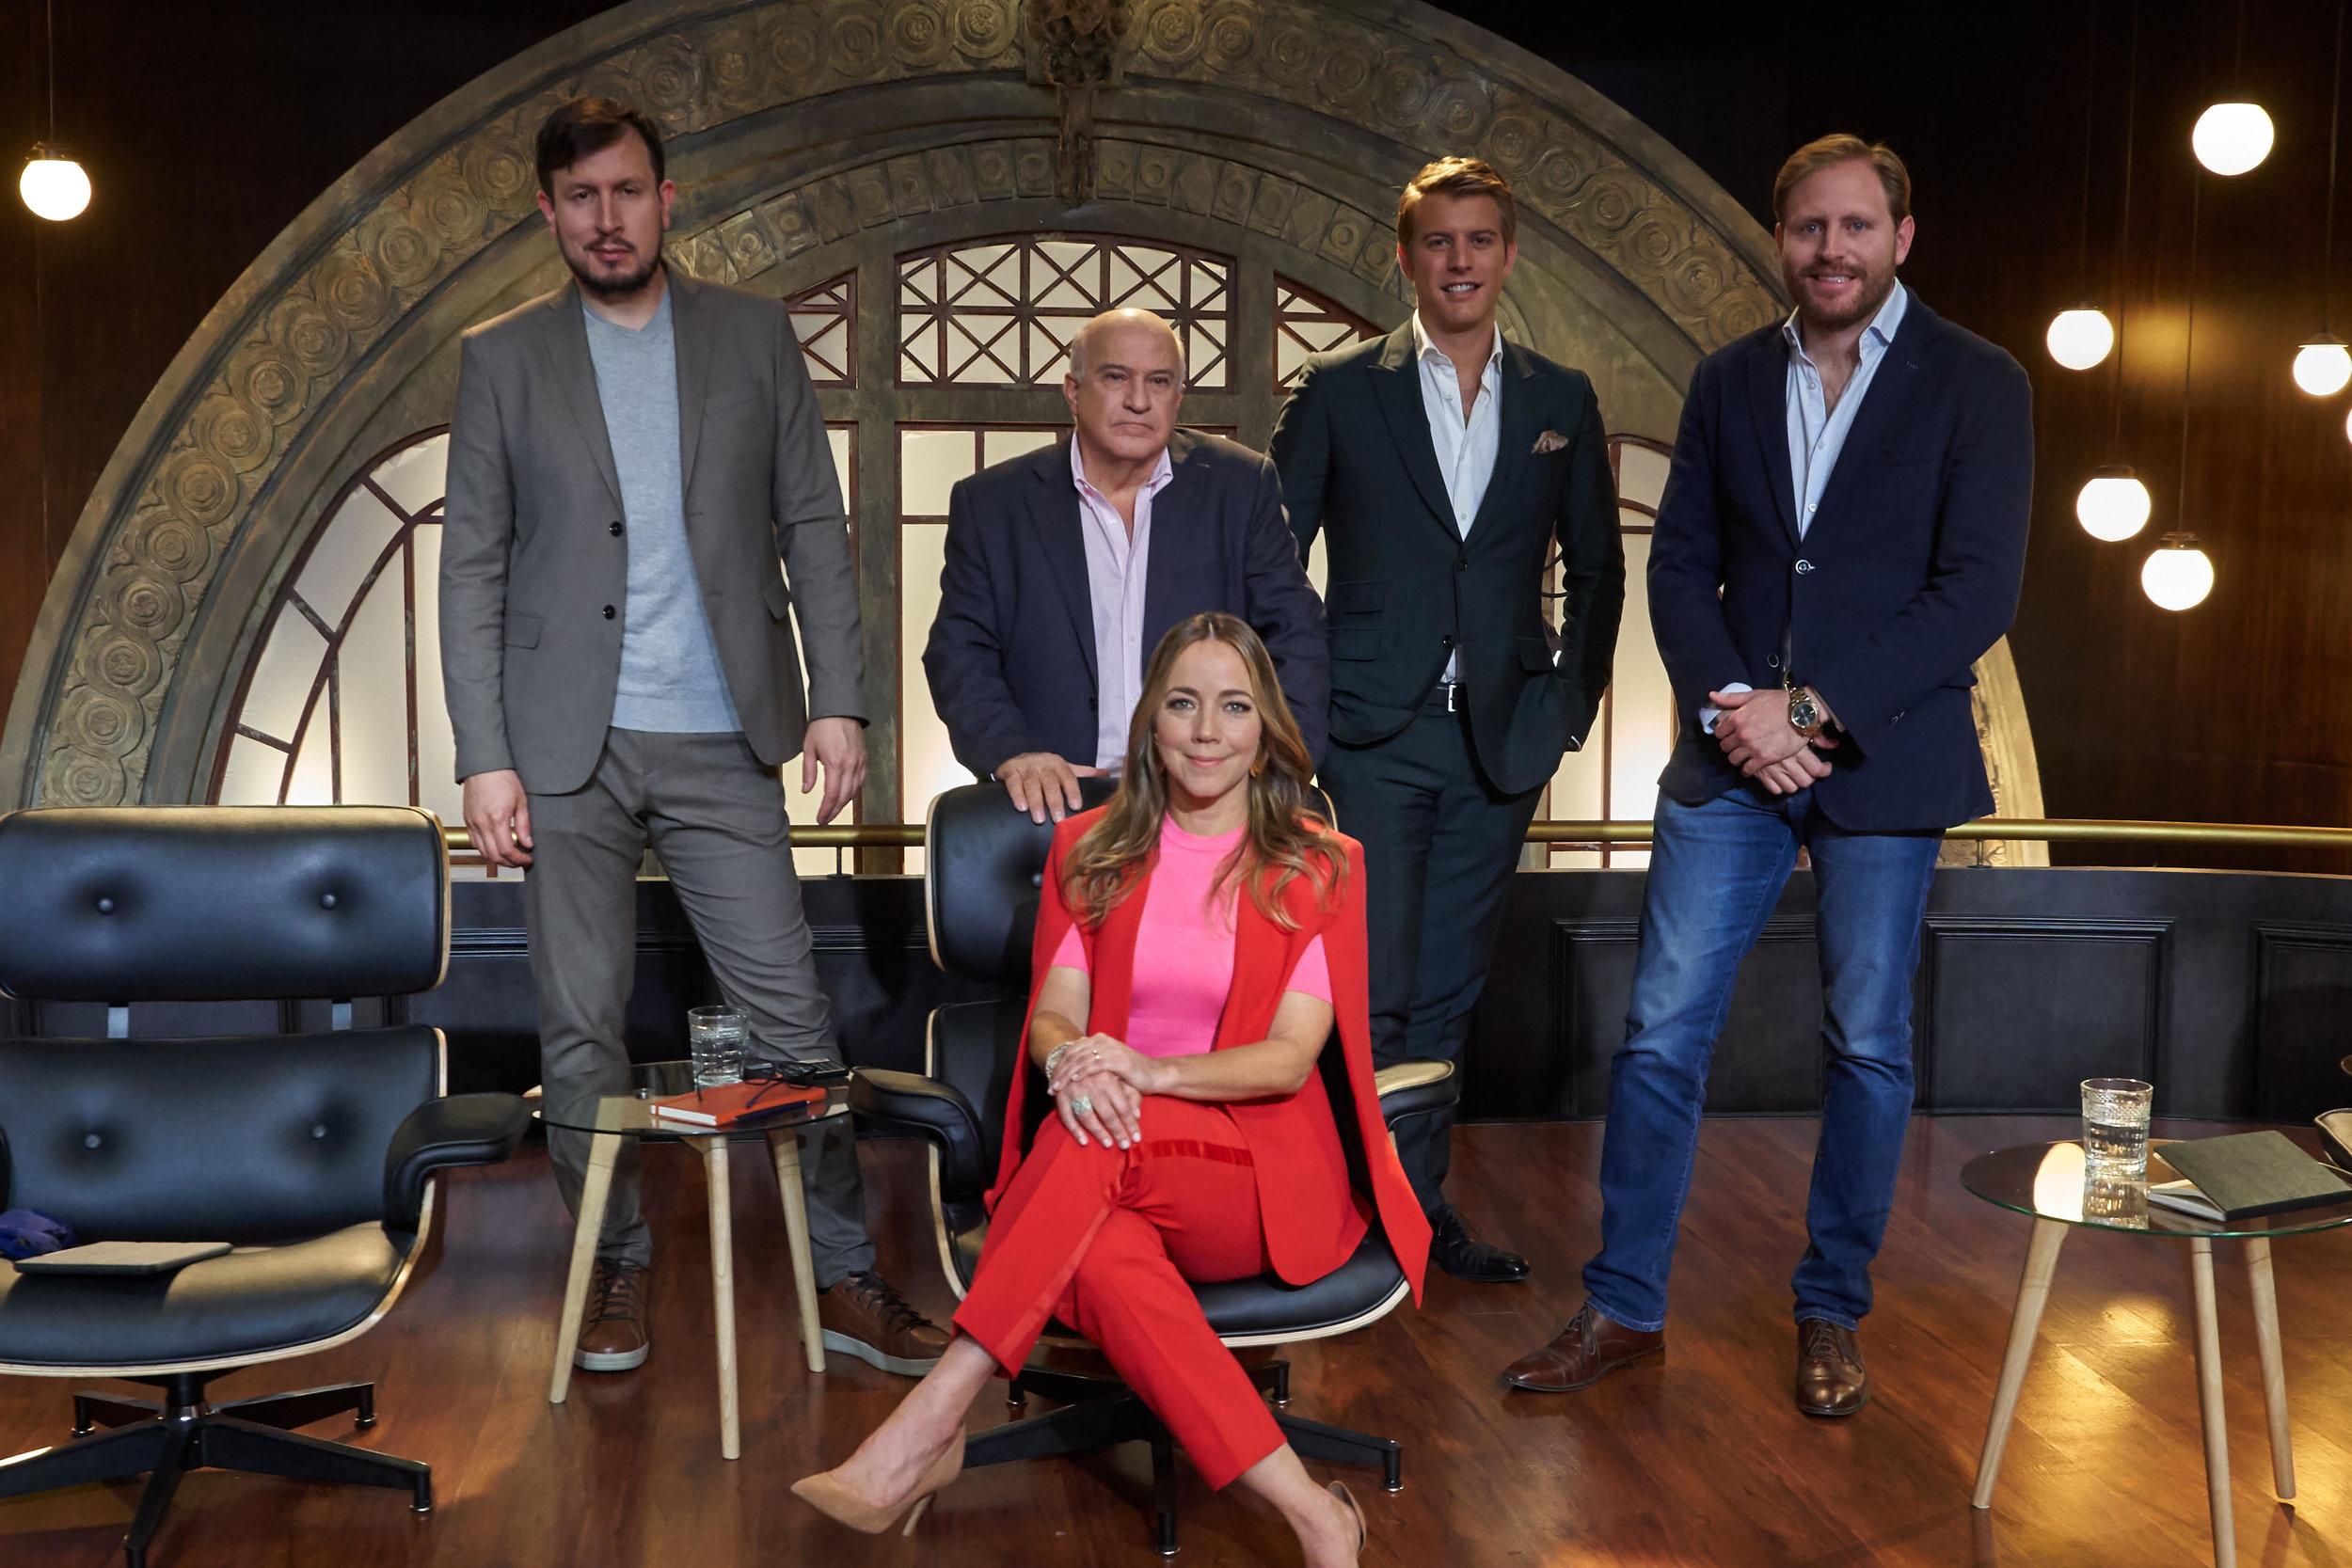 Sony Channel Latinoam é rica's Shark Tank Colombia investors